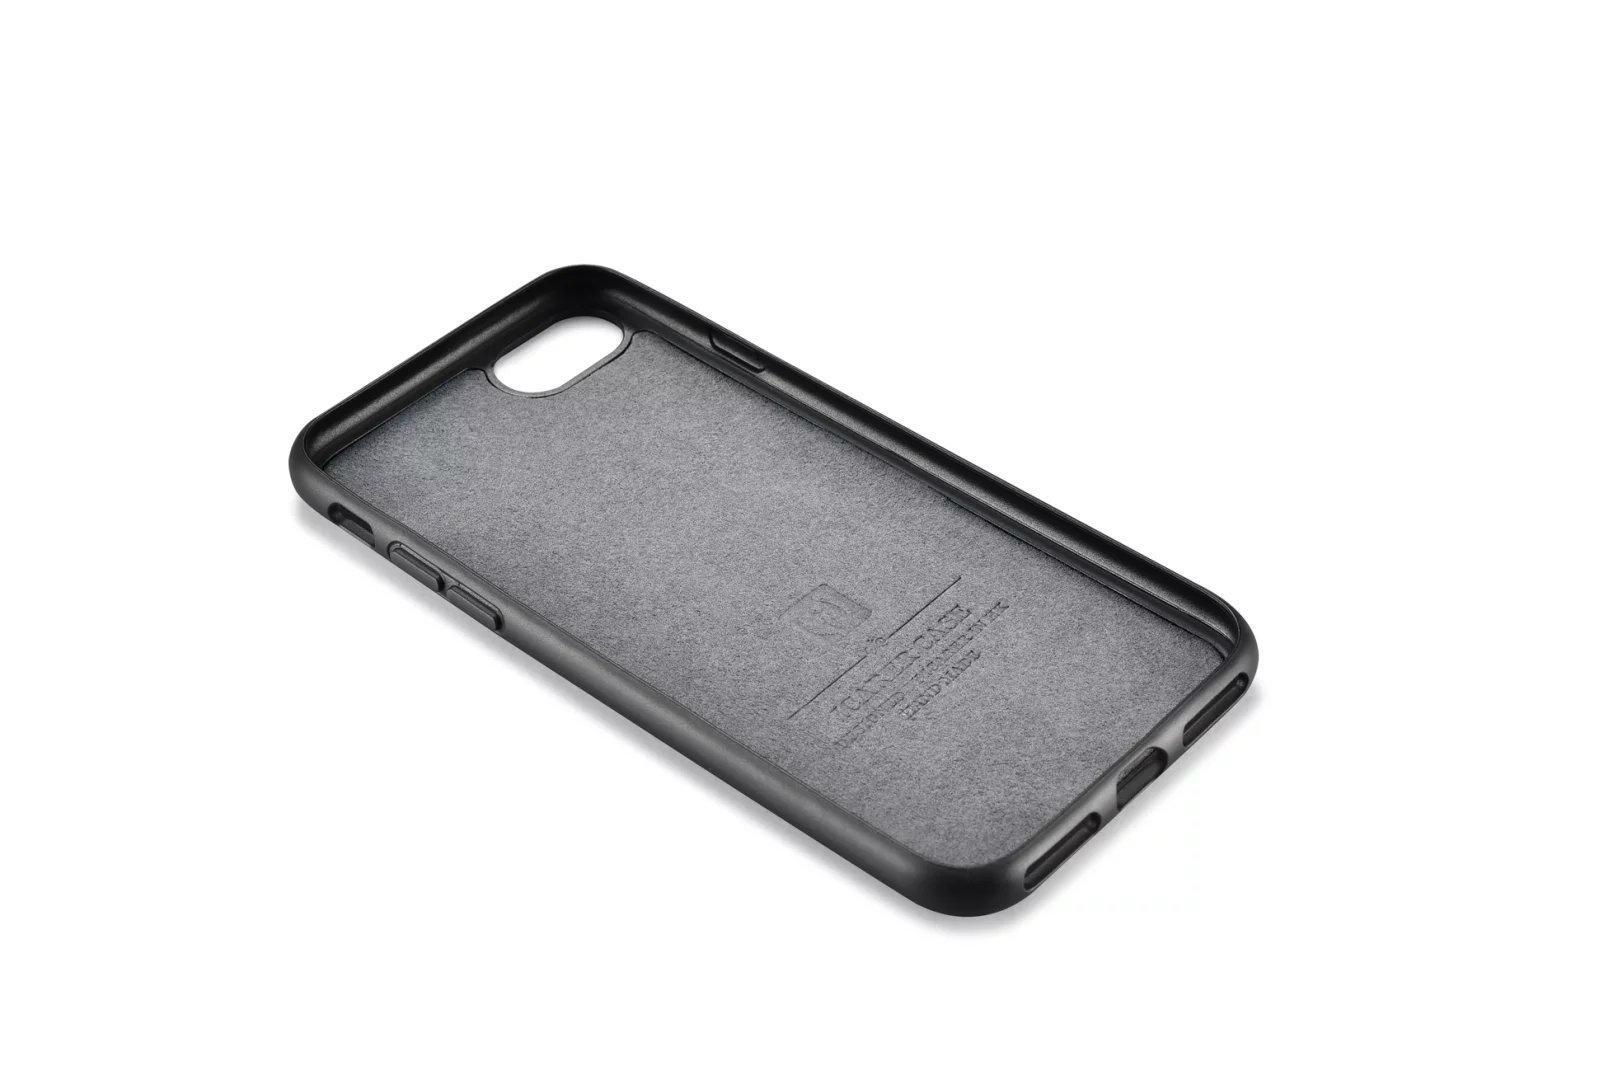 iCarer iPhone 7 Shenzhou Genuine Leather Fashional Back Cover Case 13